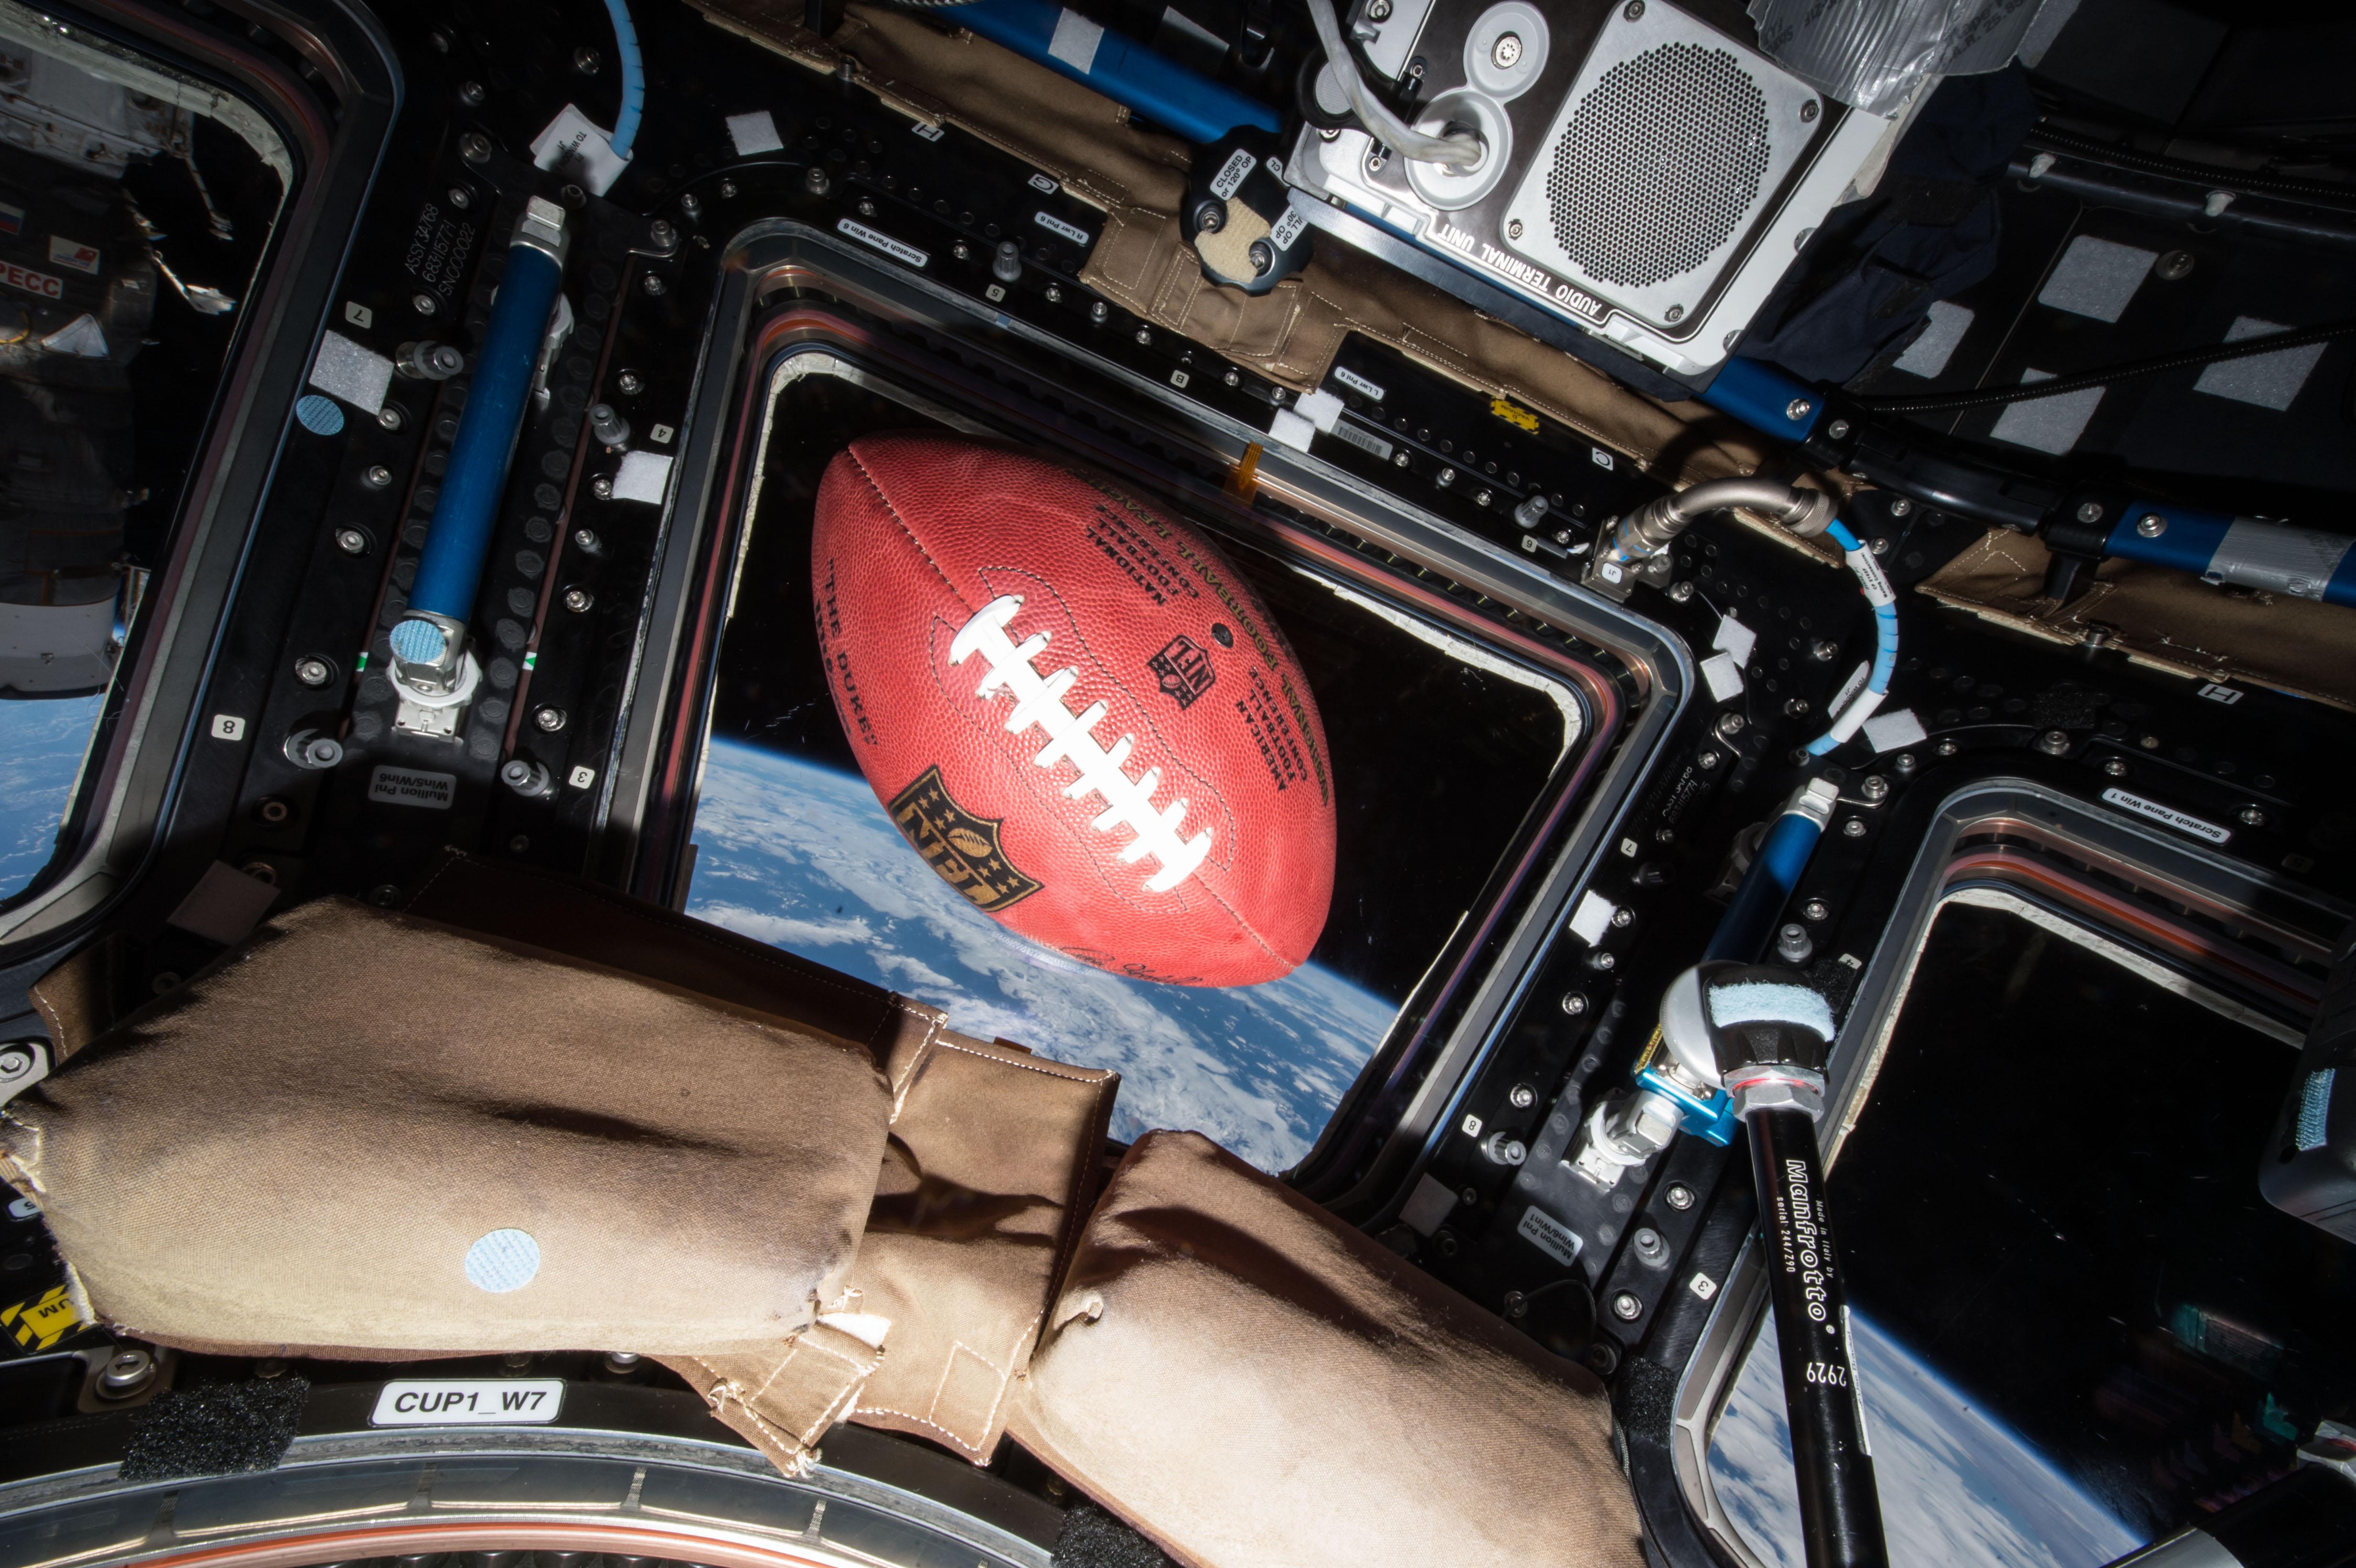 Football Physics: Green Bay's Aaron Rodgers Got Tips from Astronaut Mark Kelly